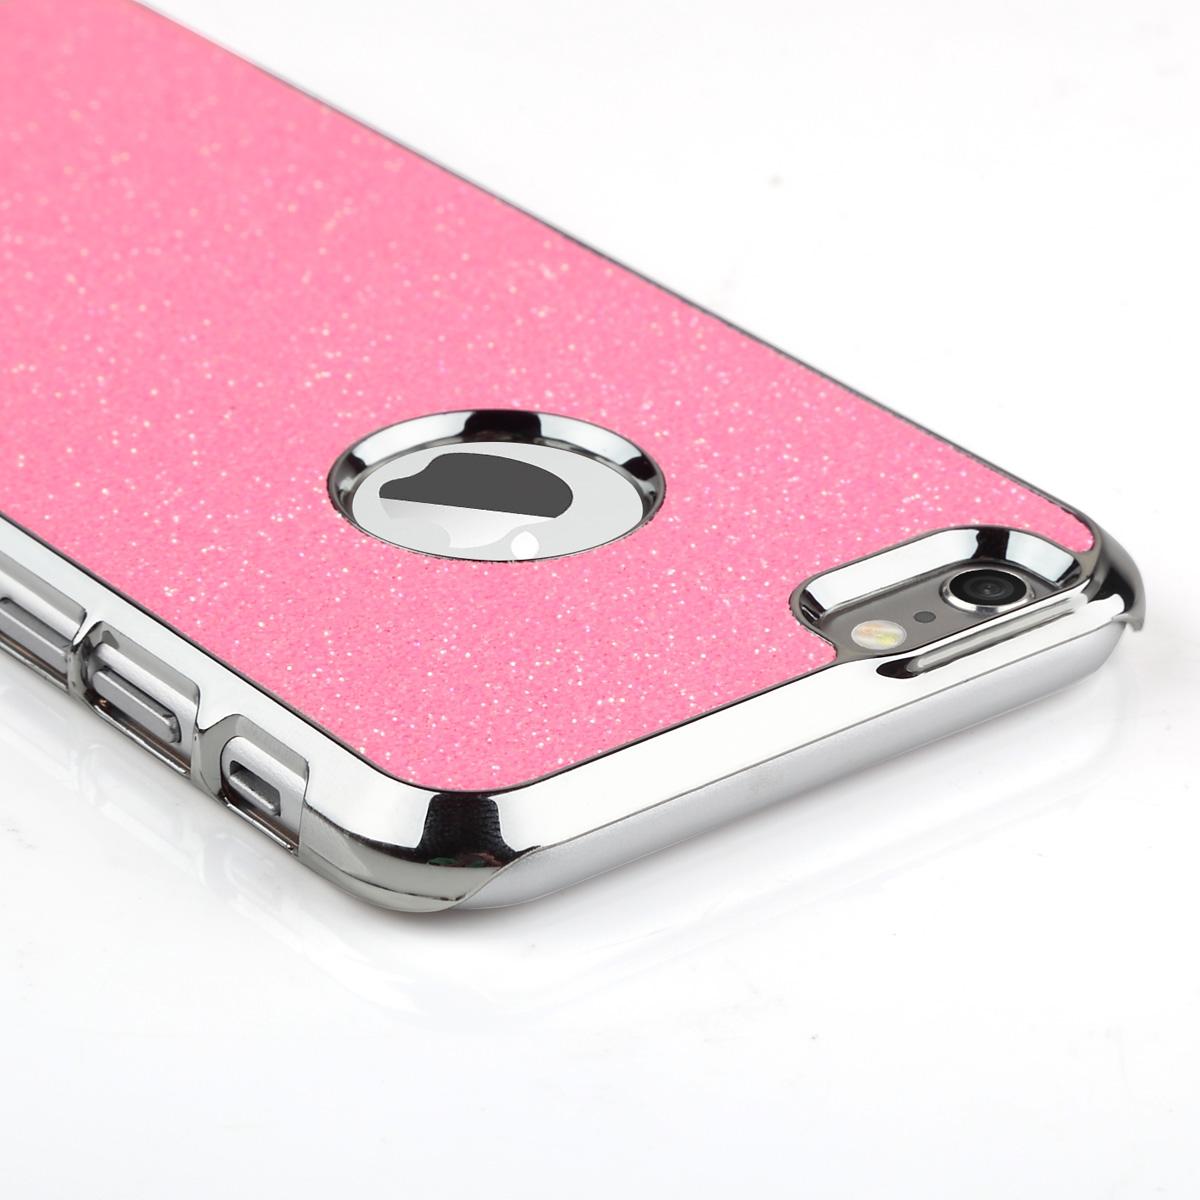 ULAK Luxury Bling Glitter Crystal Rhinestone Chrome Plastic Hard Case Cover for Apple iPhone 6/iPhone 6S 4.7 inch(China (Mainland))